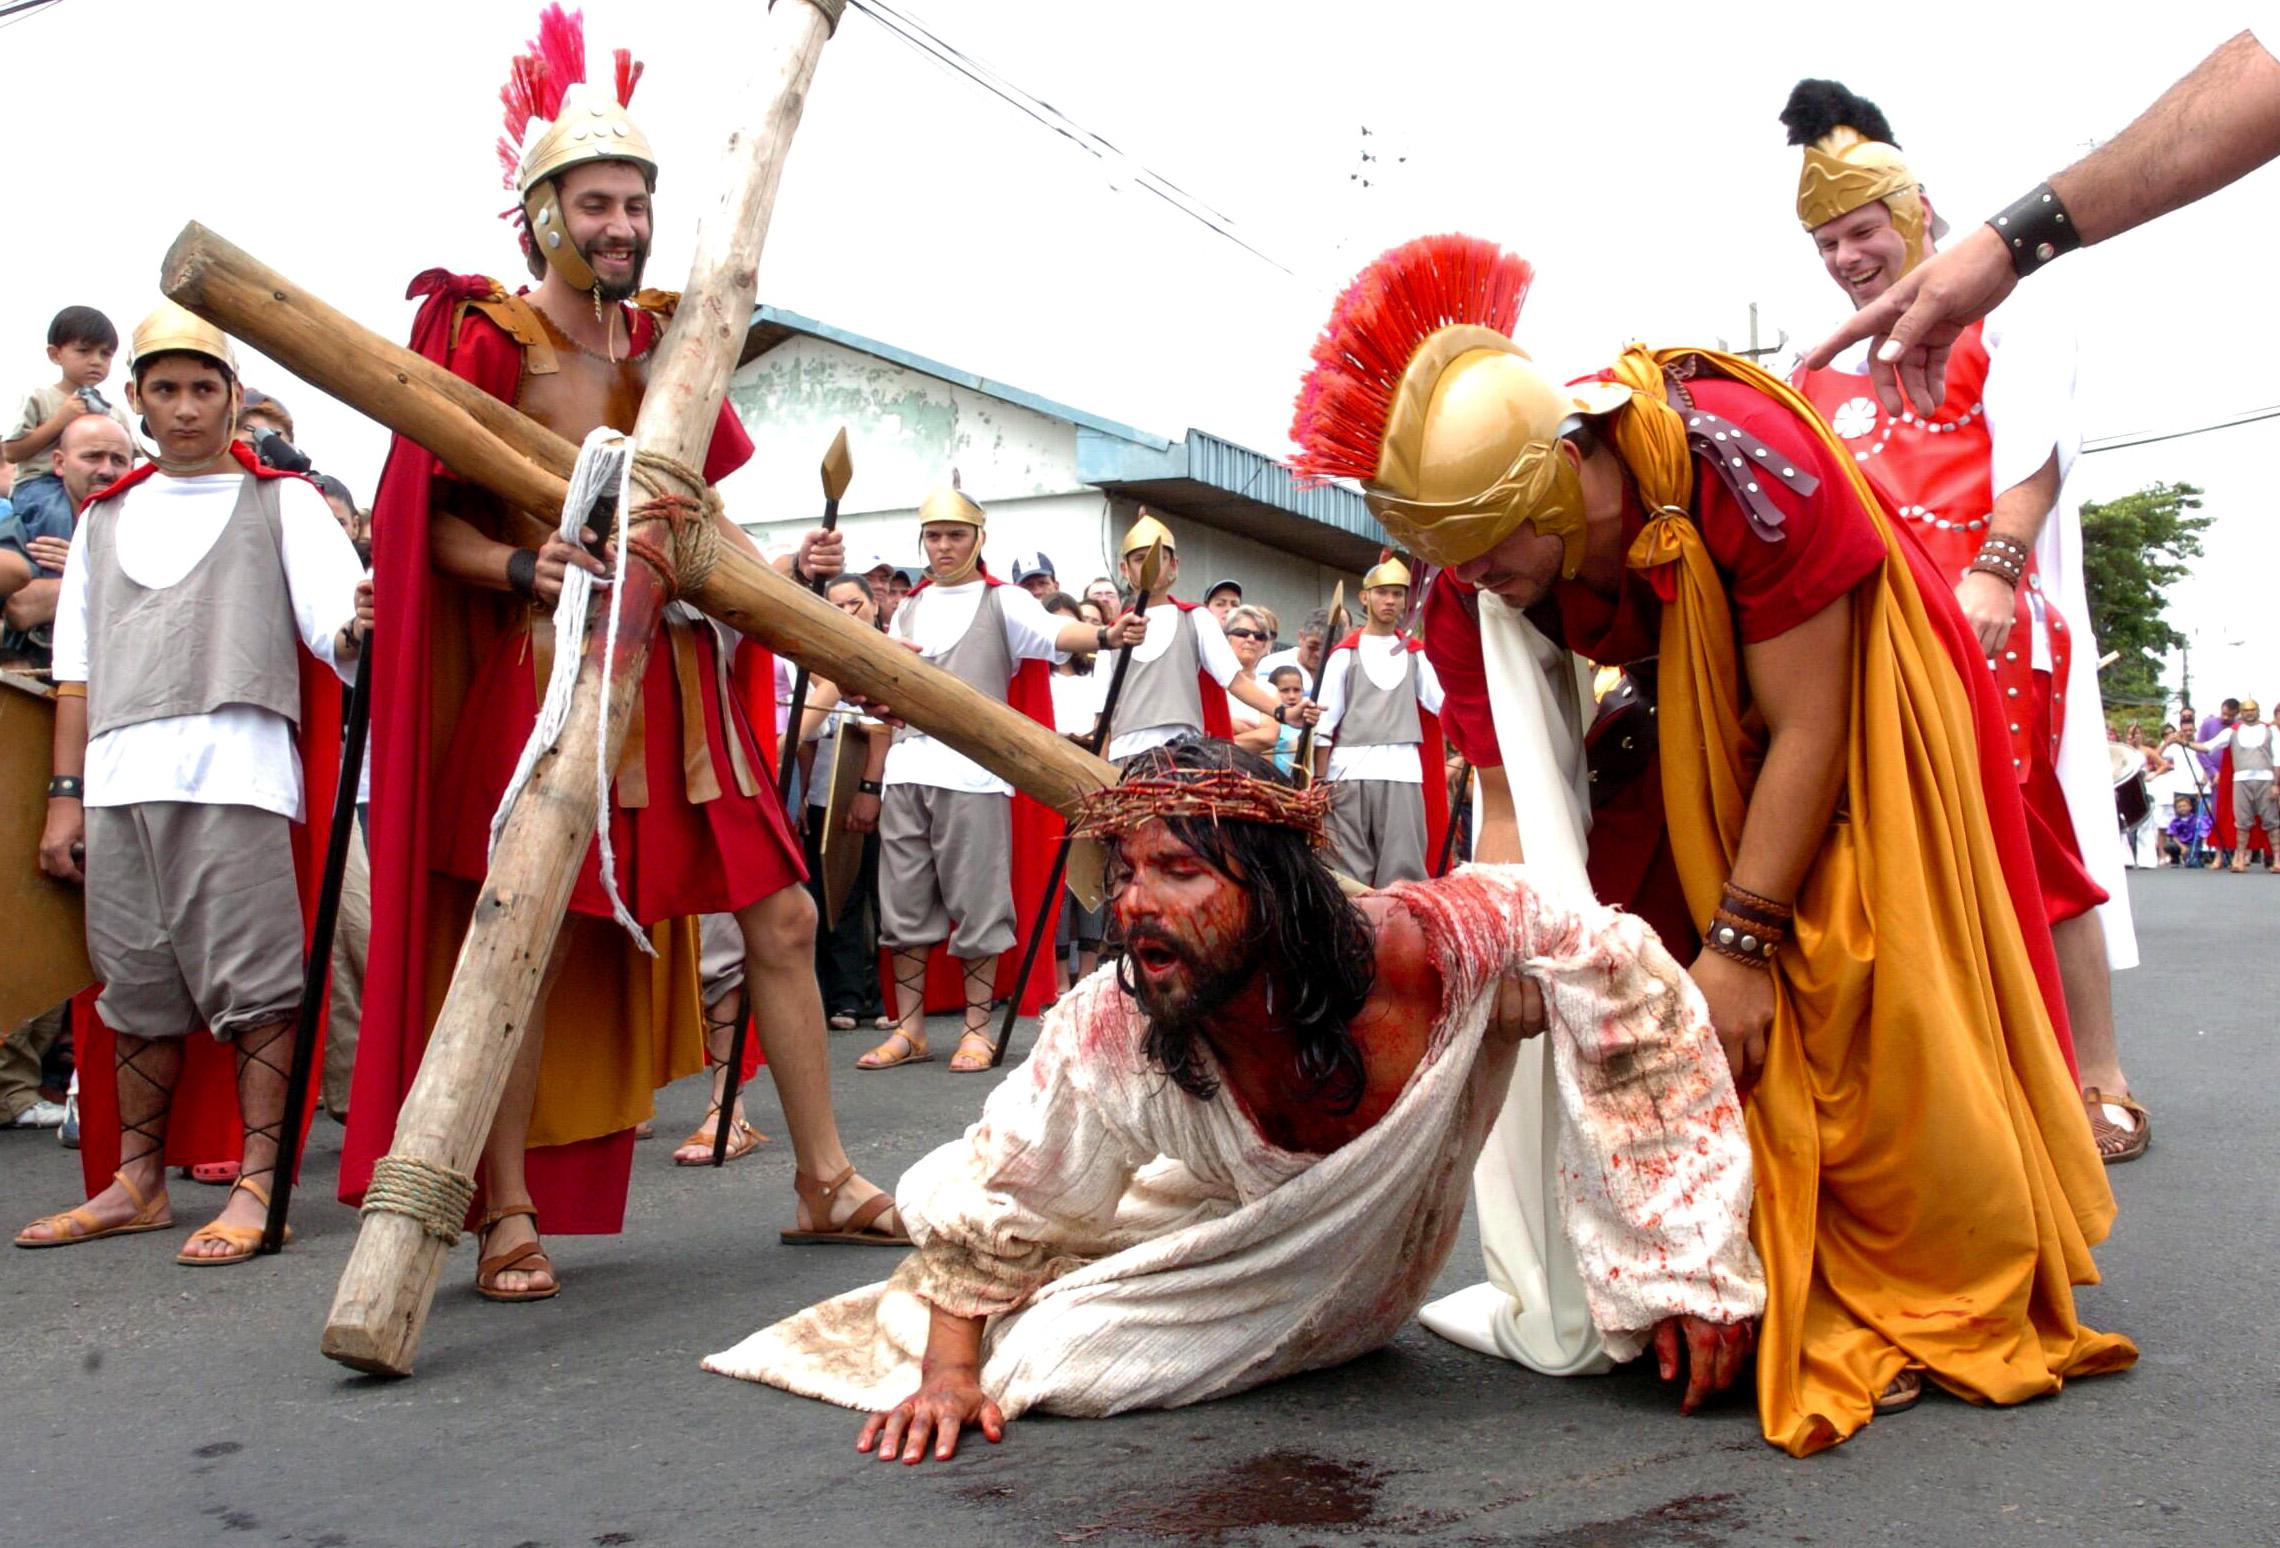 Semana santa in costa rica for Pasion com m